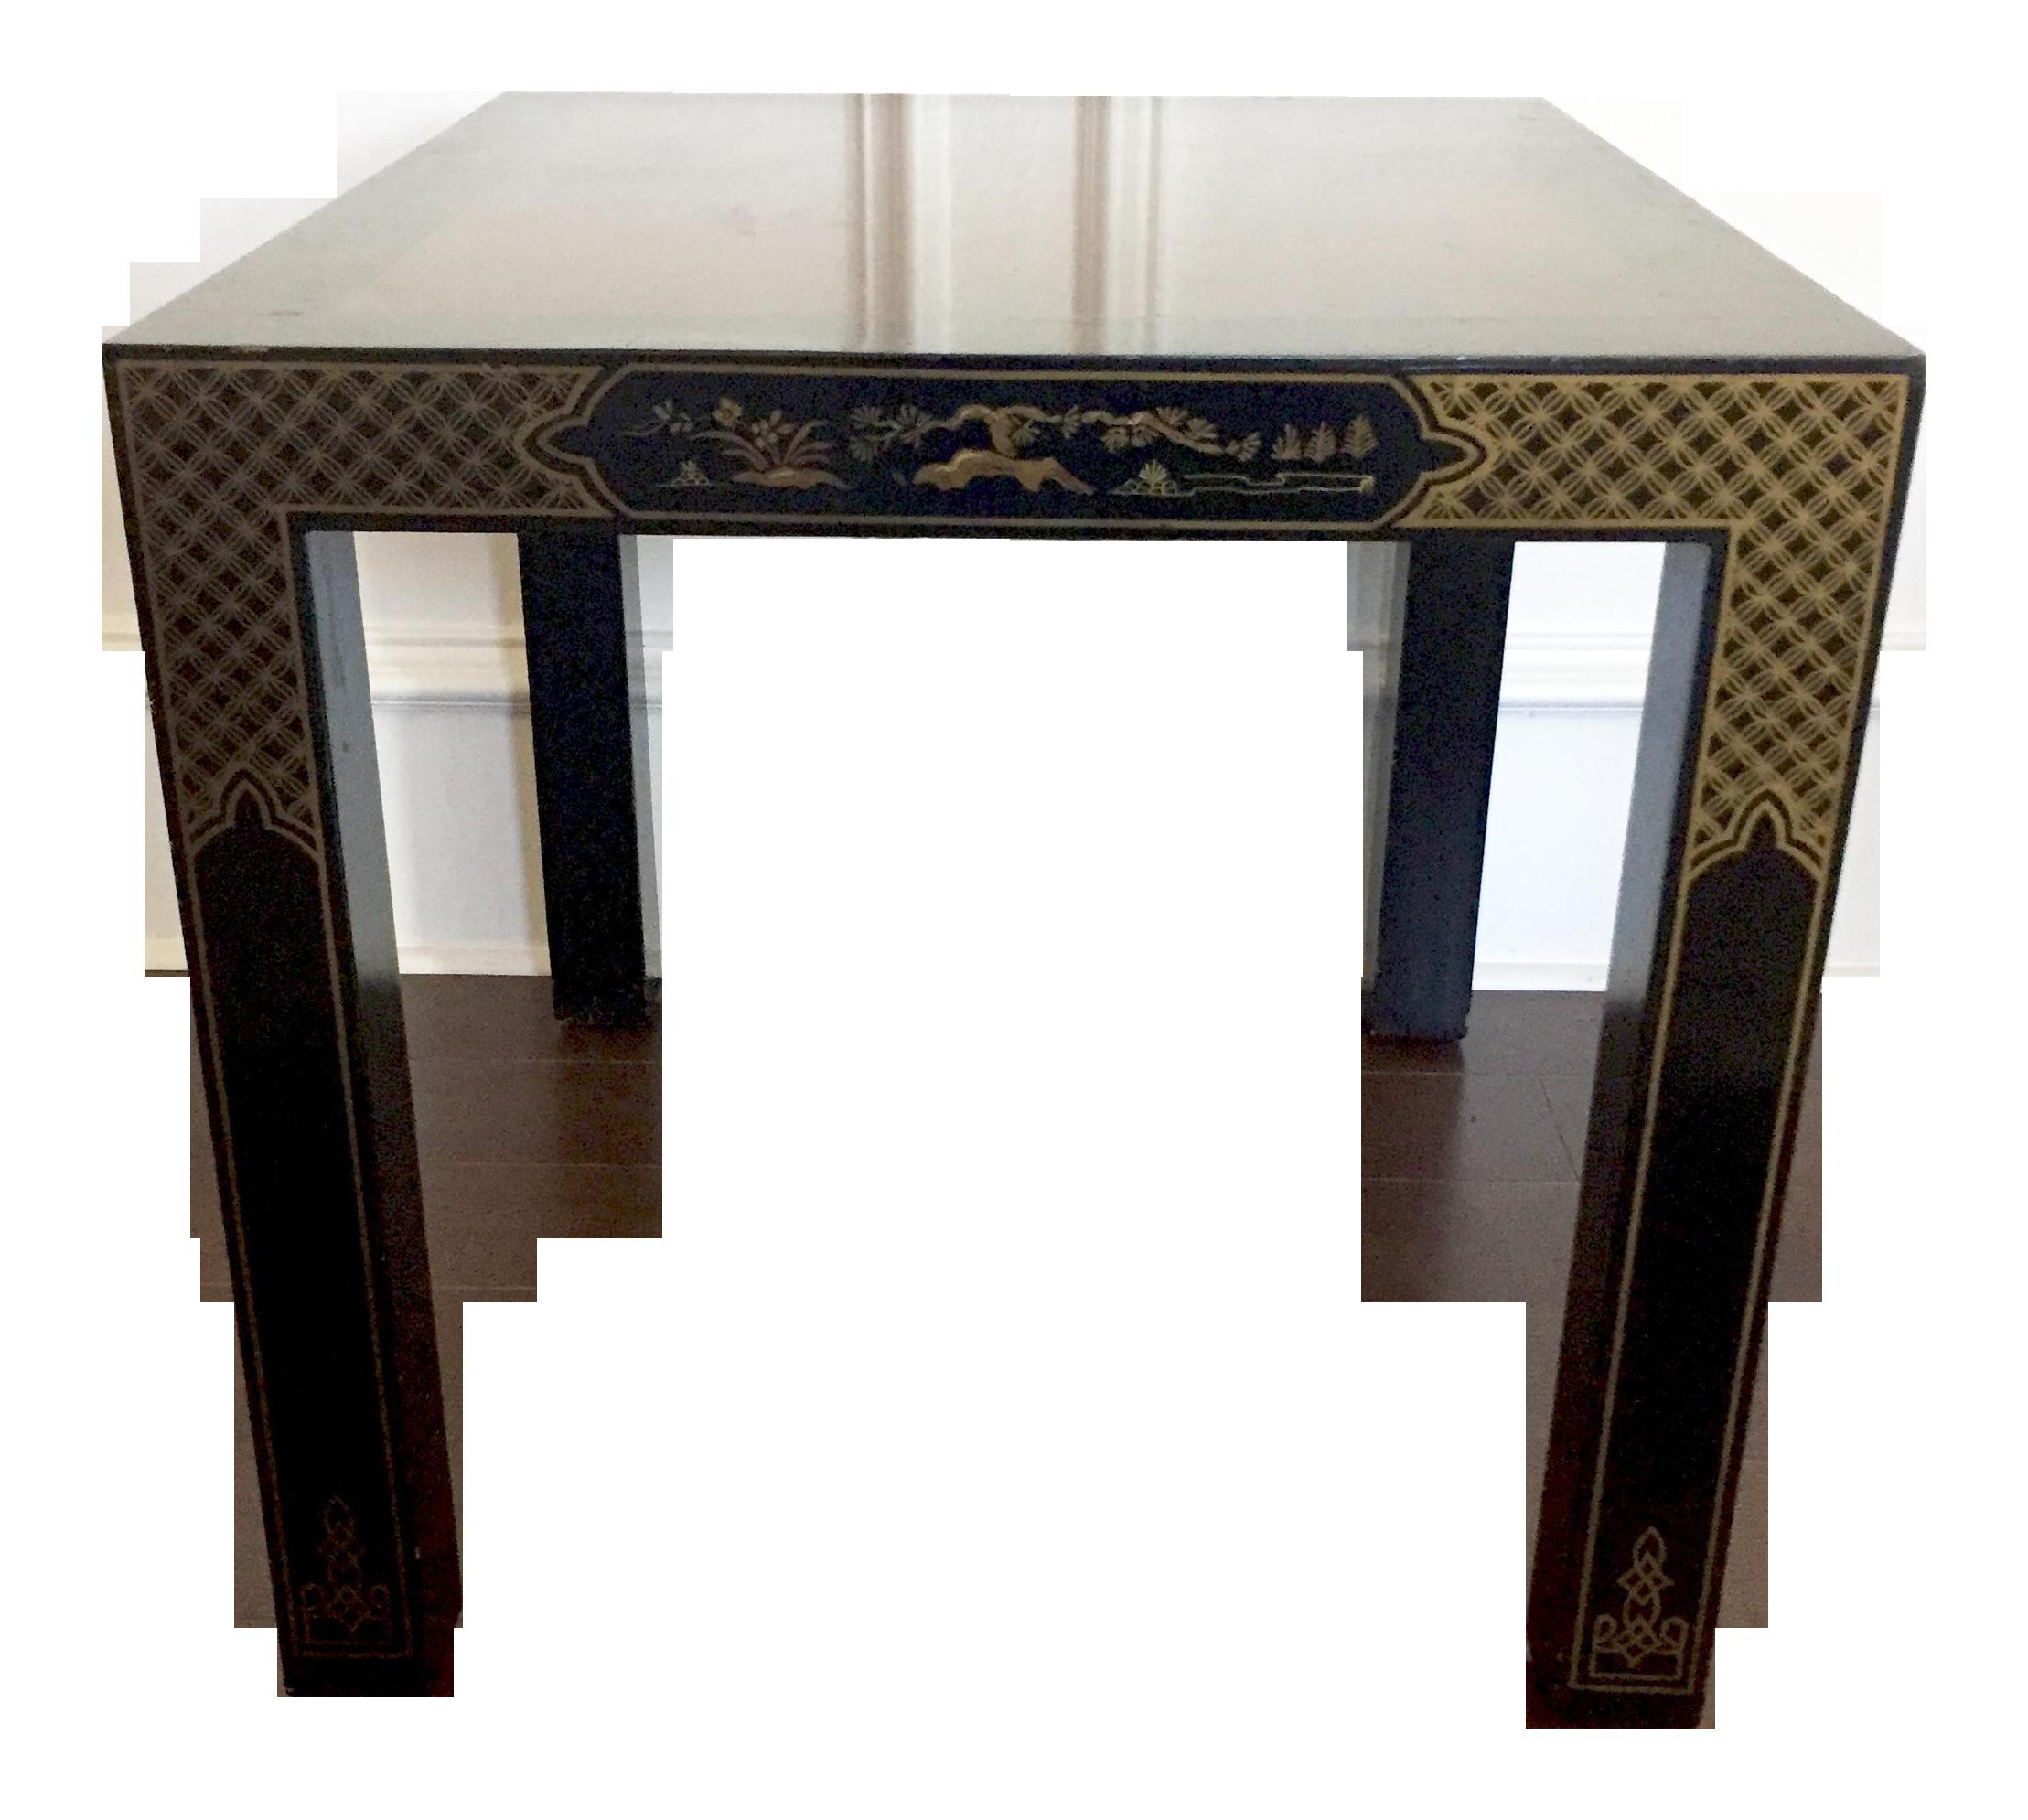 Sauder 420607 Lateral File Cabinet 3681 L X 2201 W X